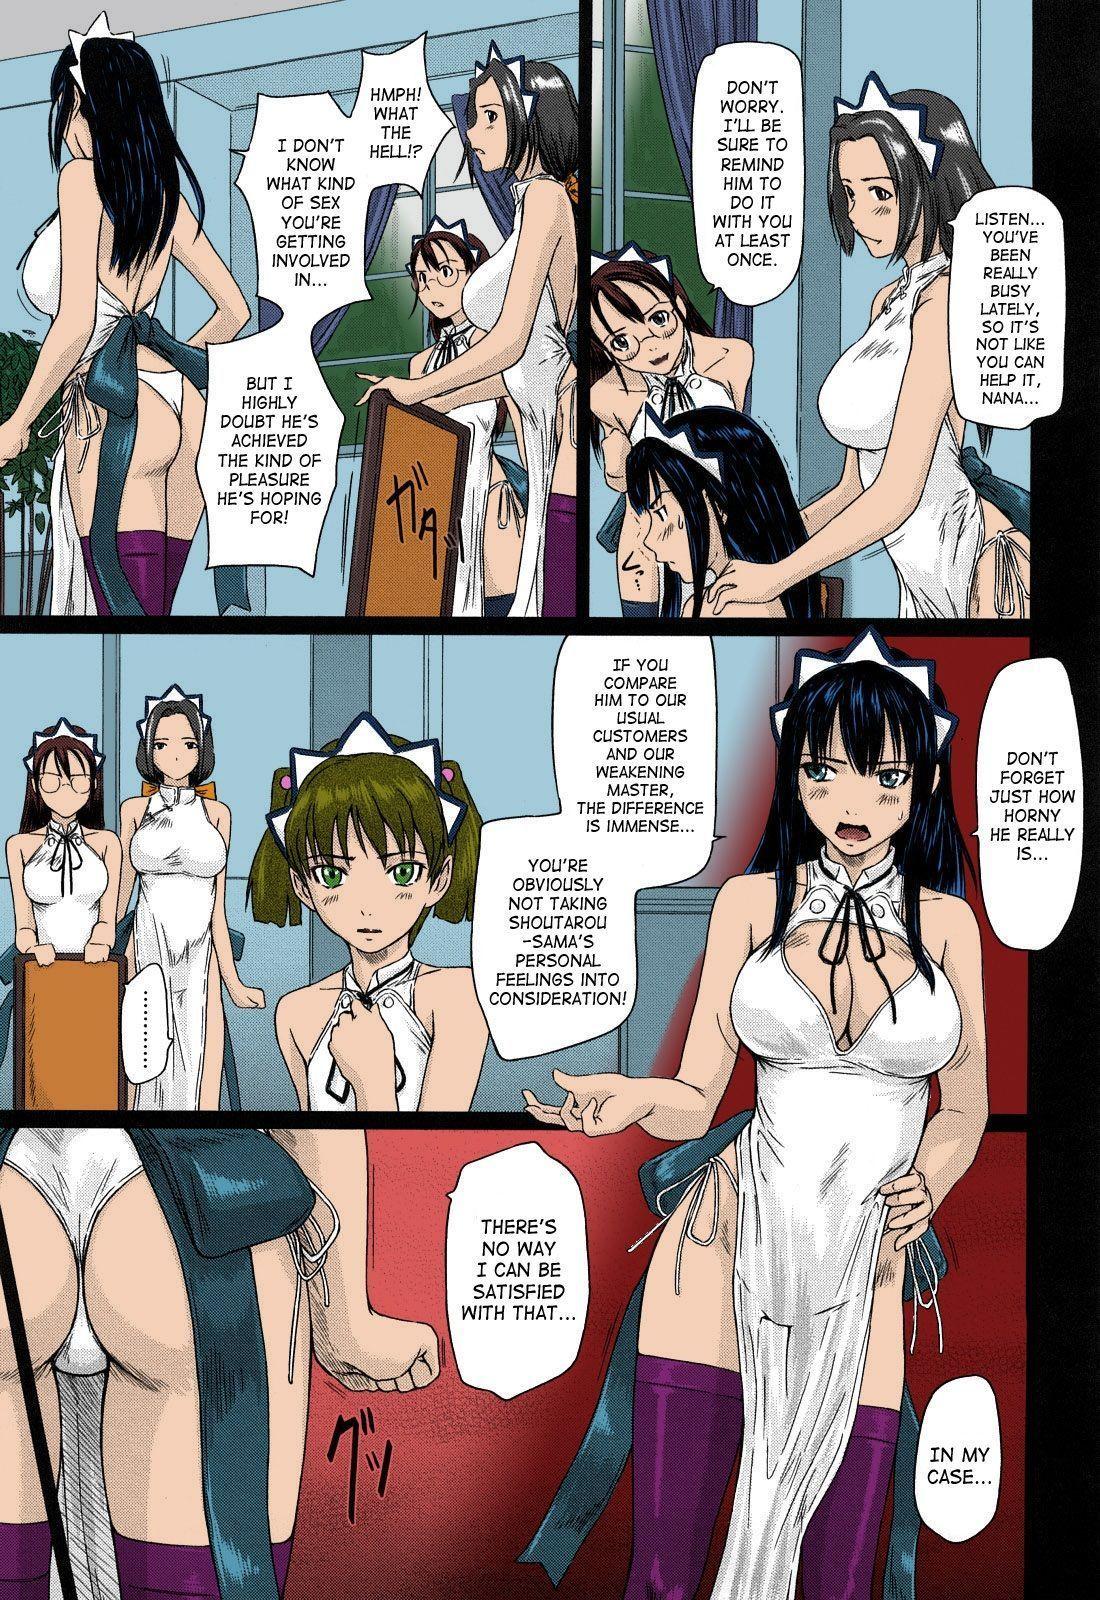 Kisaragi Gunma Mai Favorite Ch. 1-5 SaHa Decensored Colorized - part 5